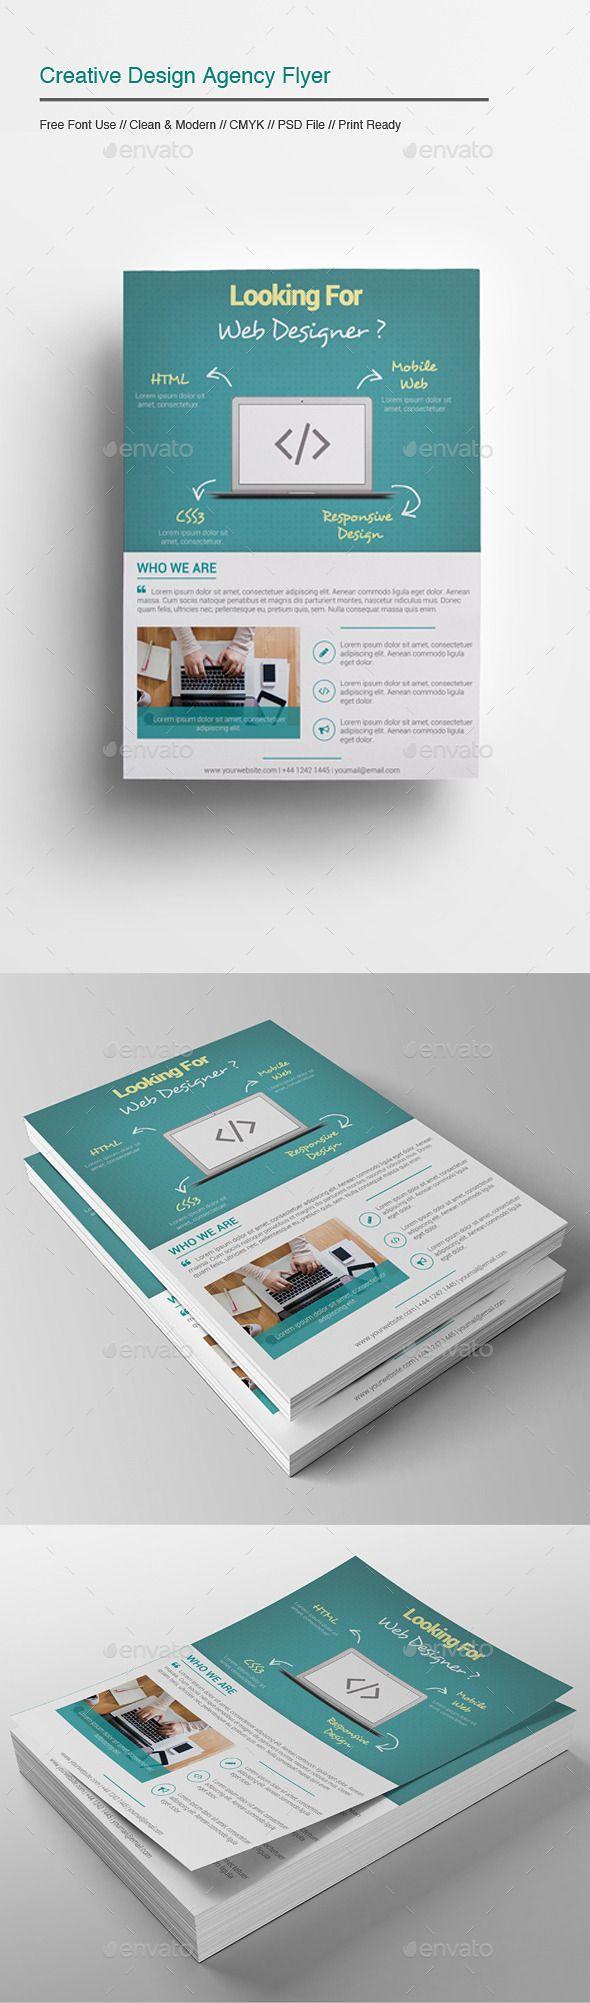 Creative Design Agency Flyer - Corporate Flyers